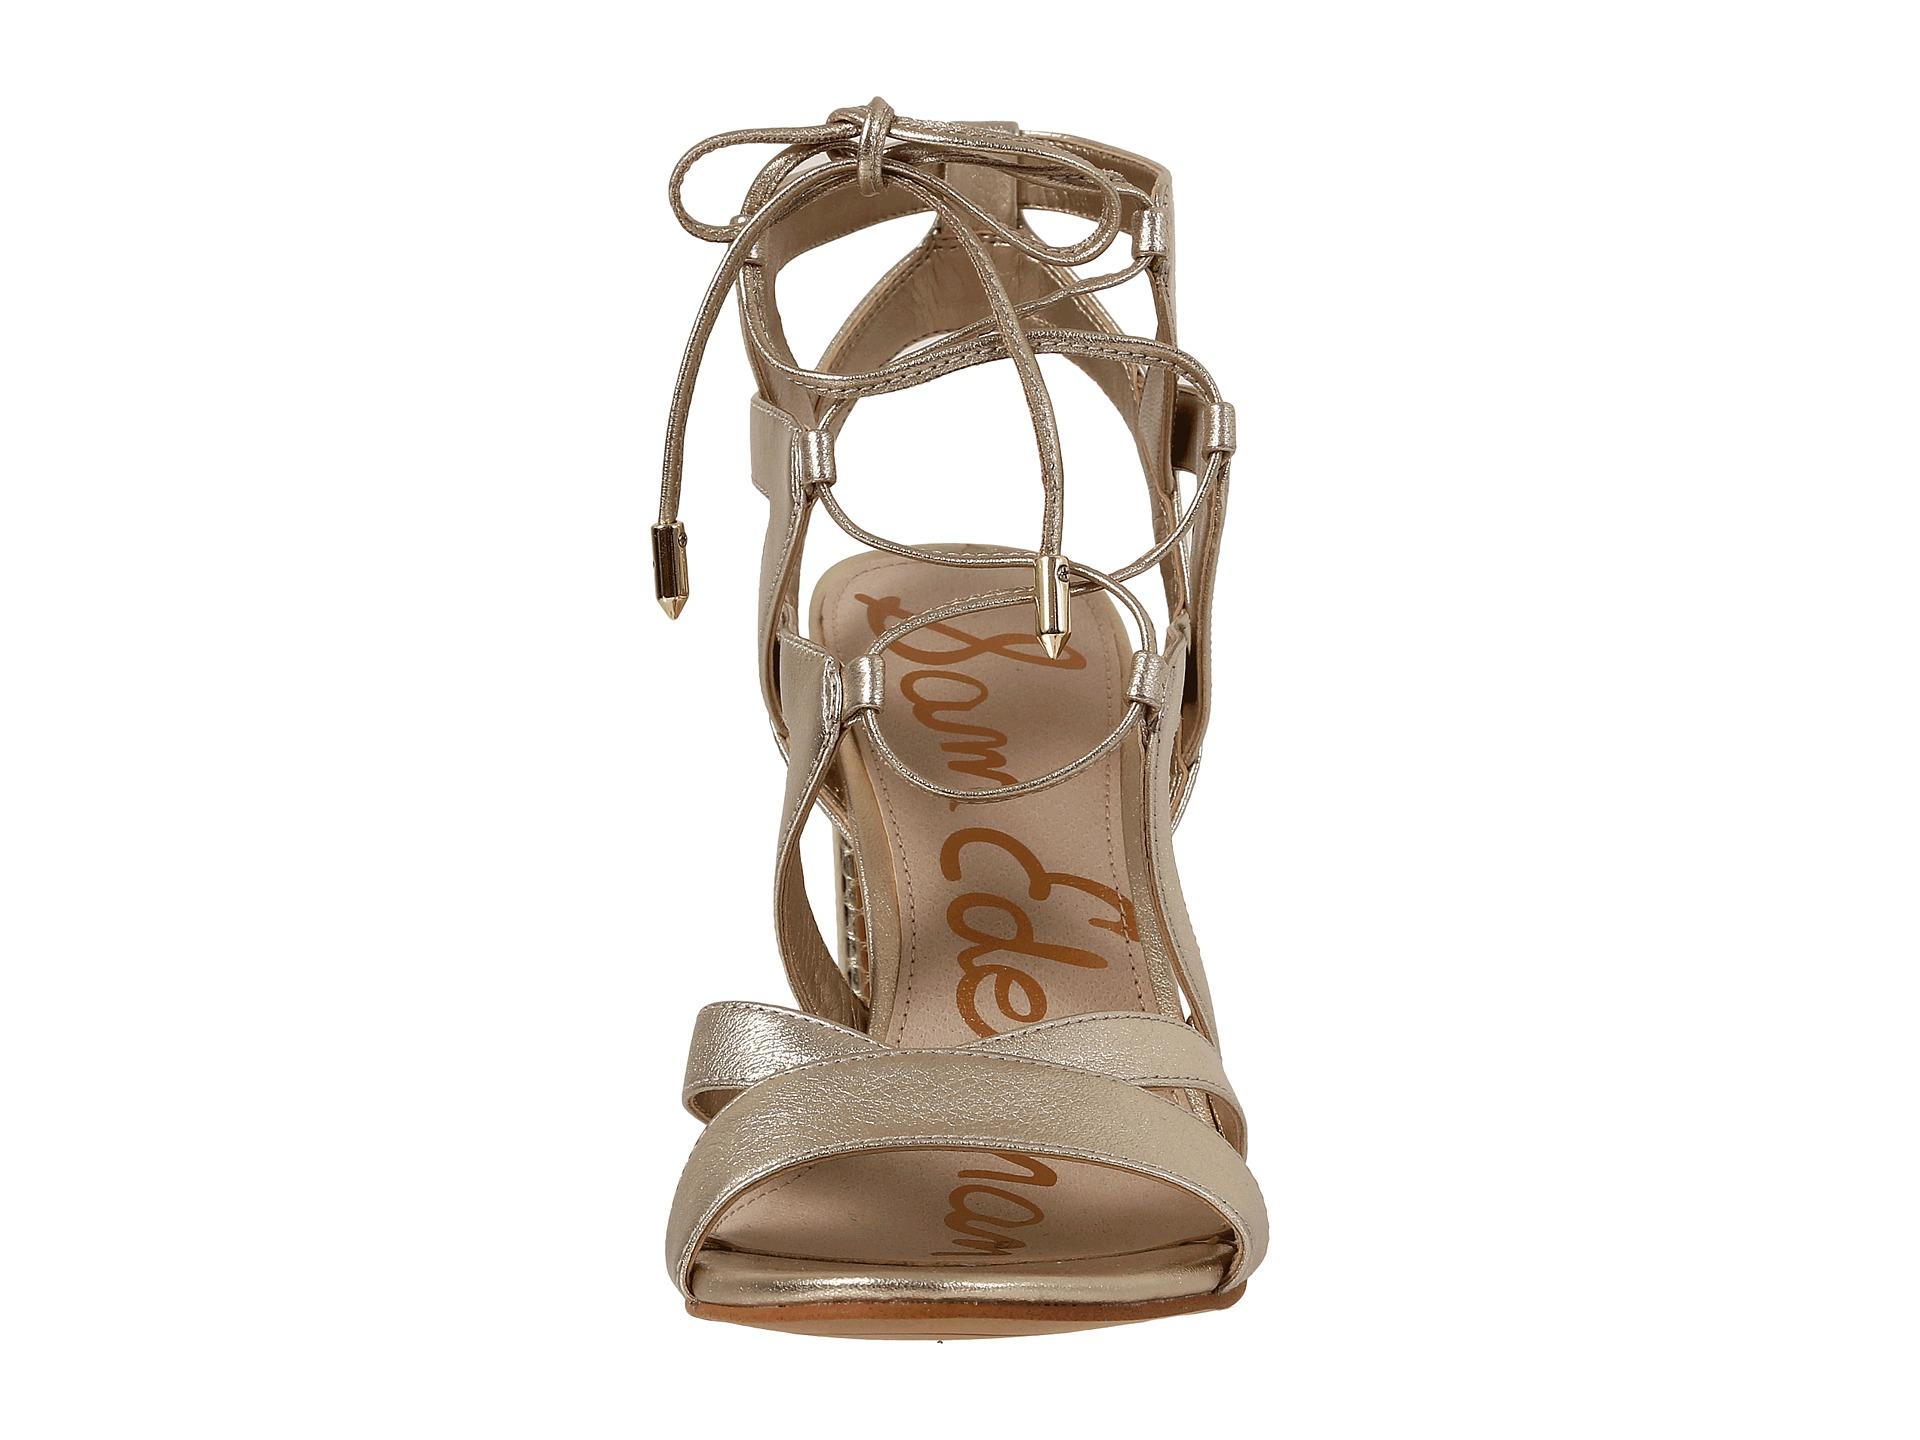 1848127de Lyst - Sam Edelman Yardley Metallic Cut-Out Leather Sandals in Metallic